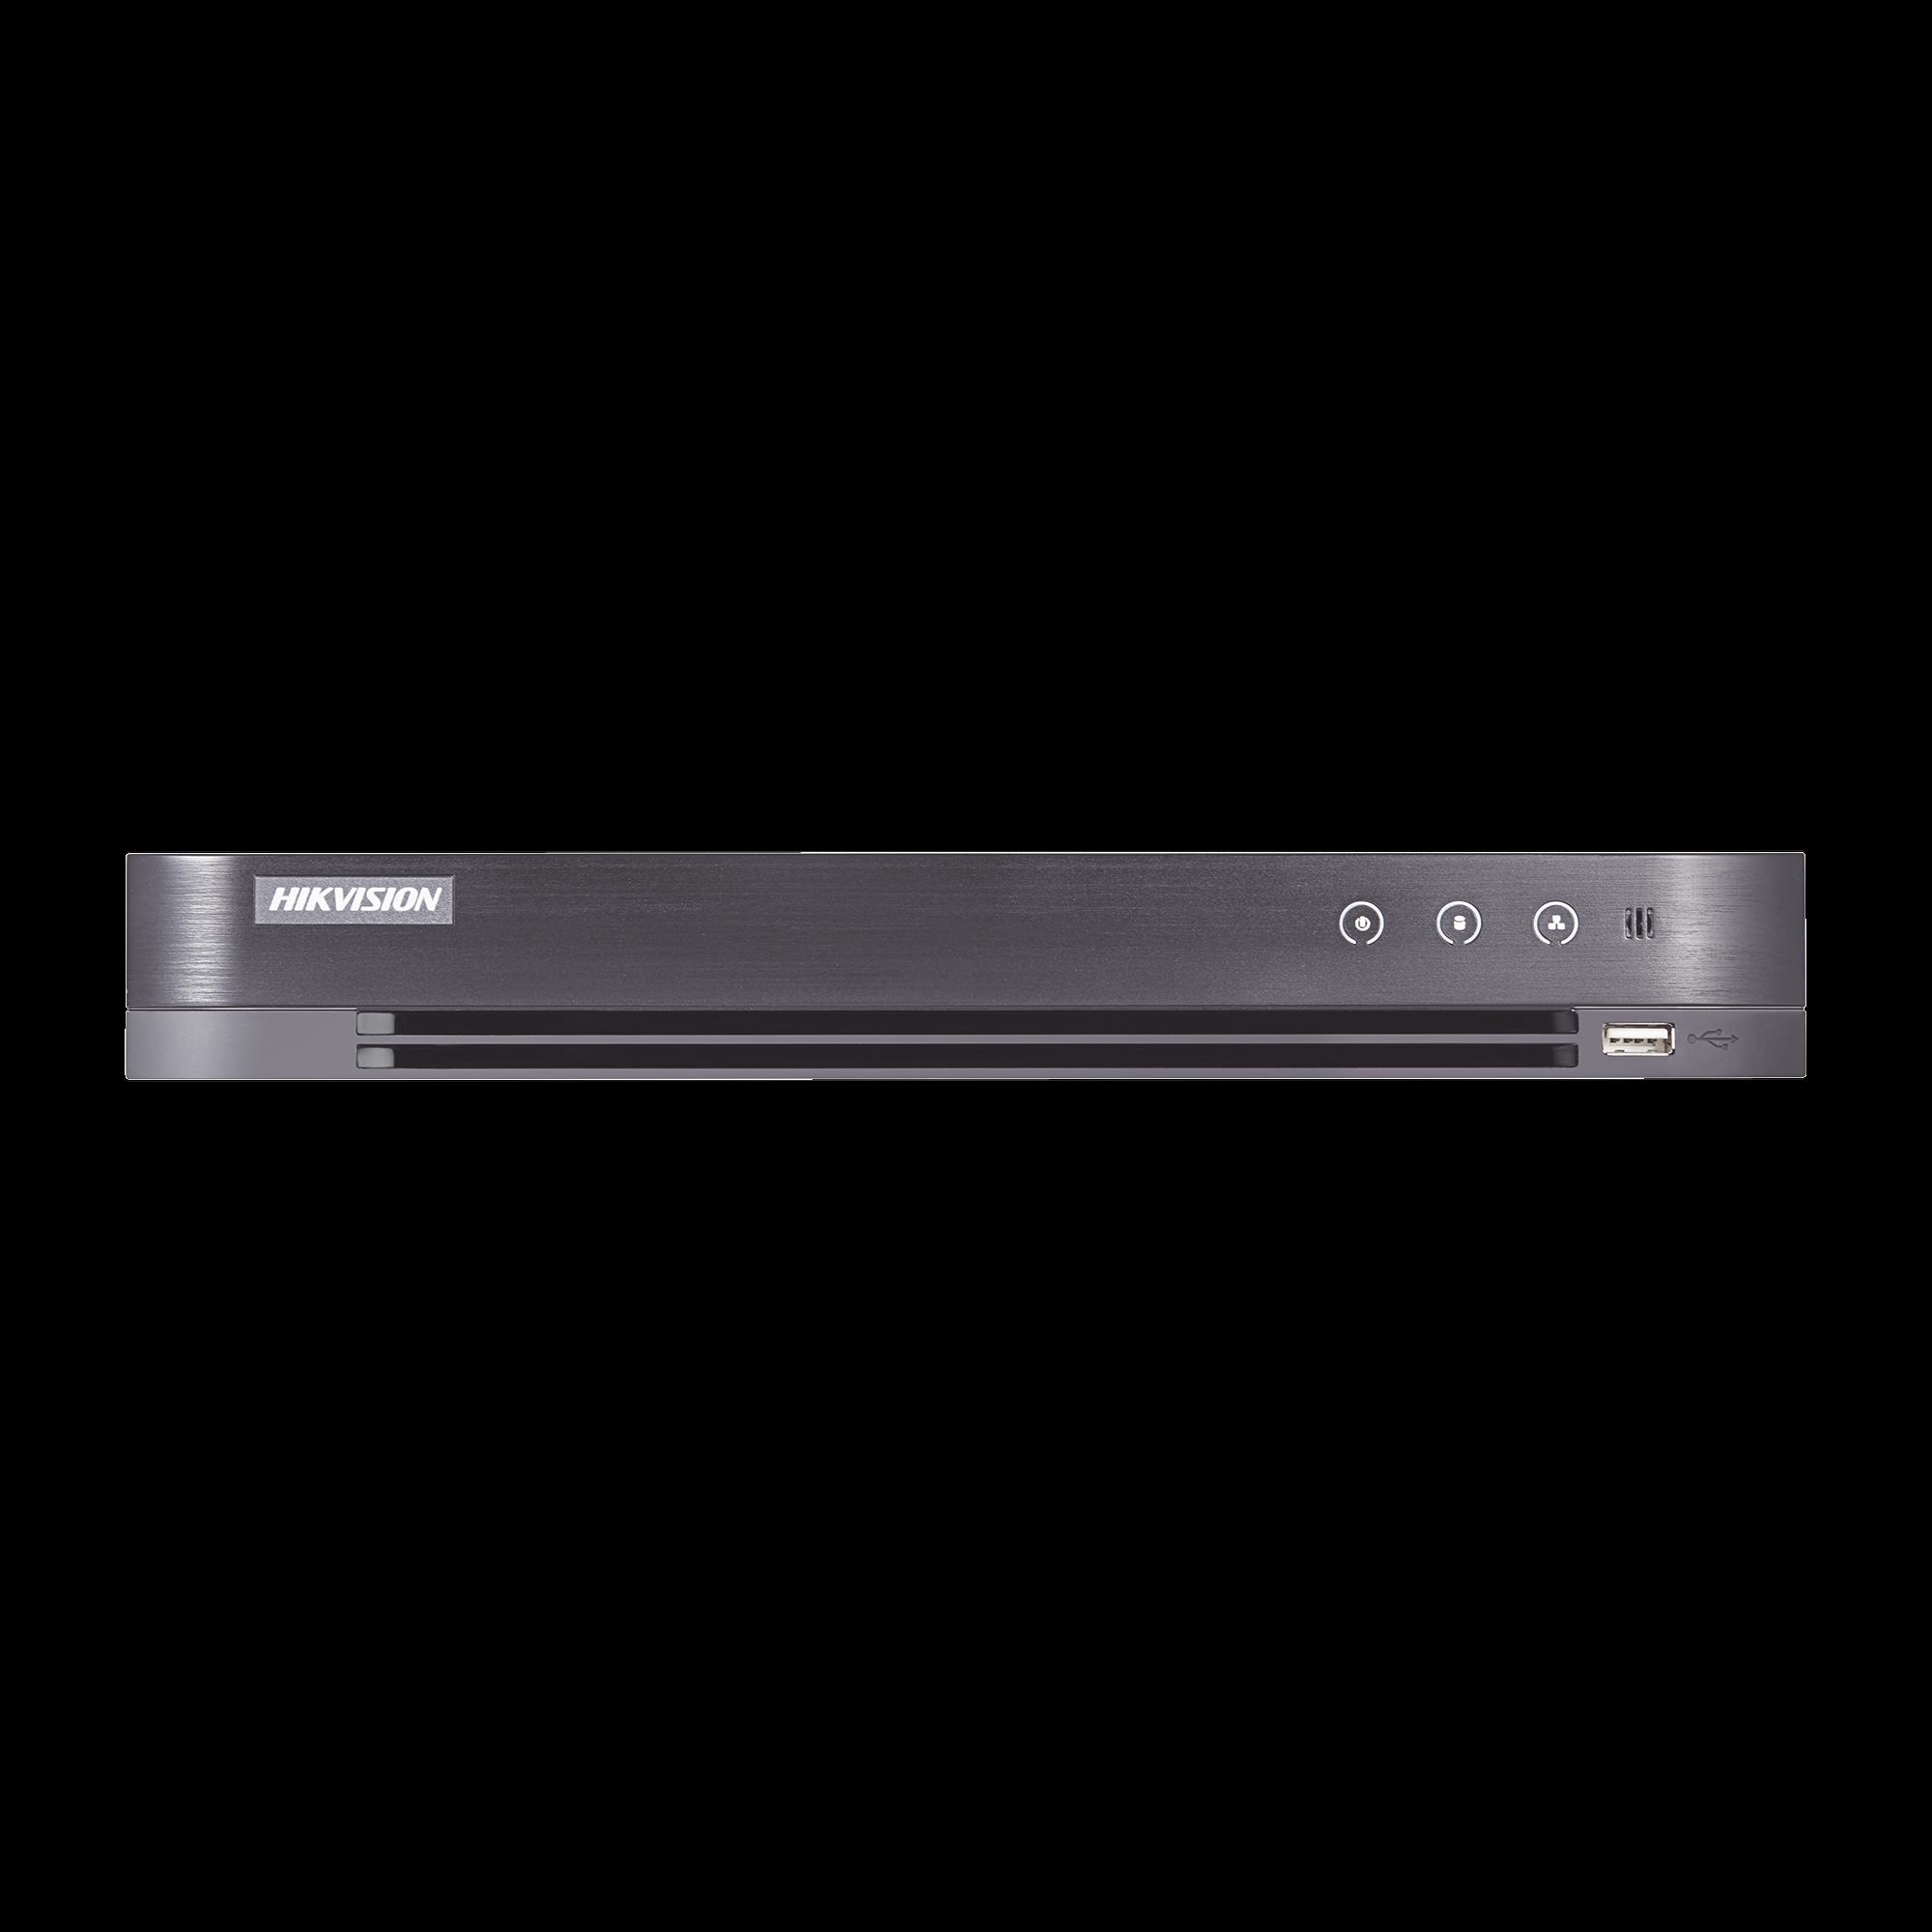 DVR 3 Megapixel / 4 Canales TURBOHD + 2 Canales IP / 1 Bahía de Disco Duro / 1 Canal de Audio / Vídeo análisis